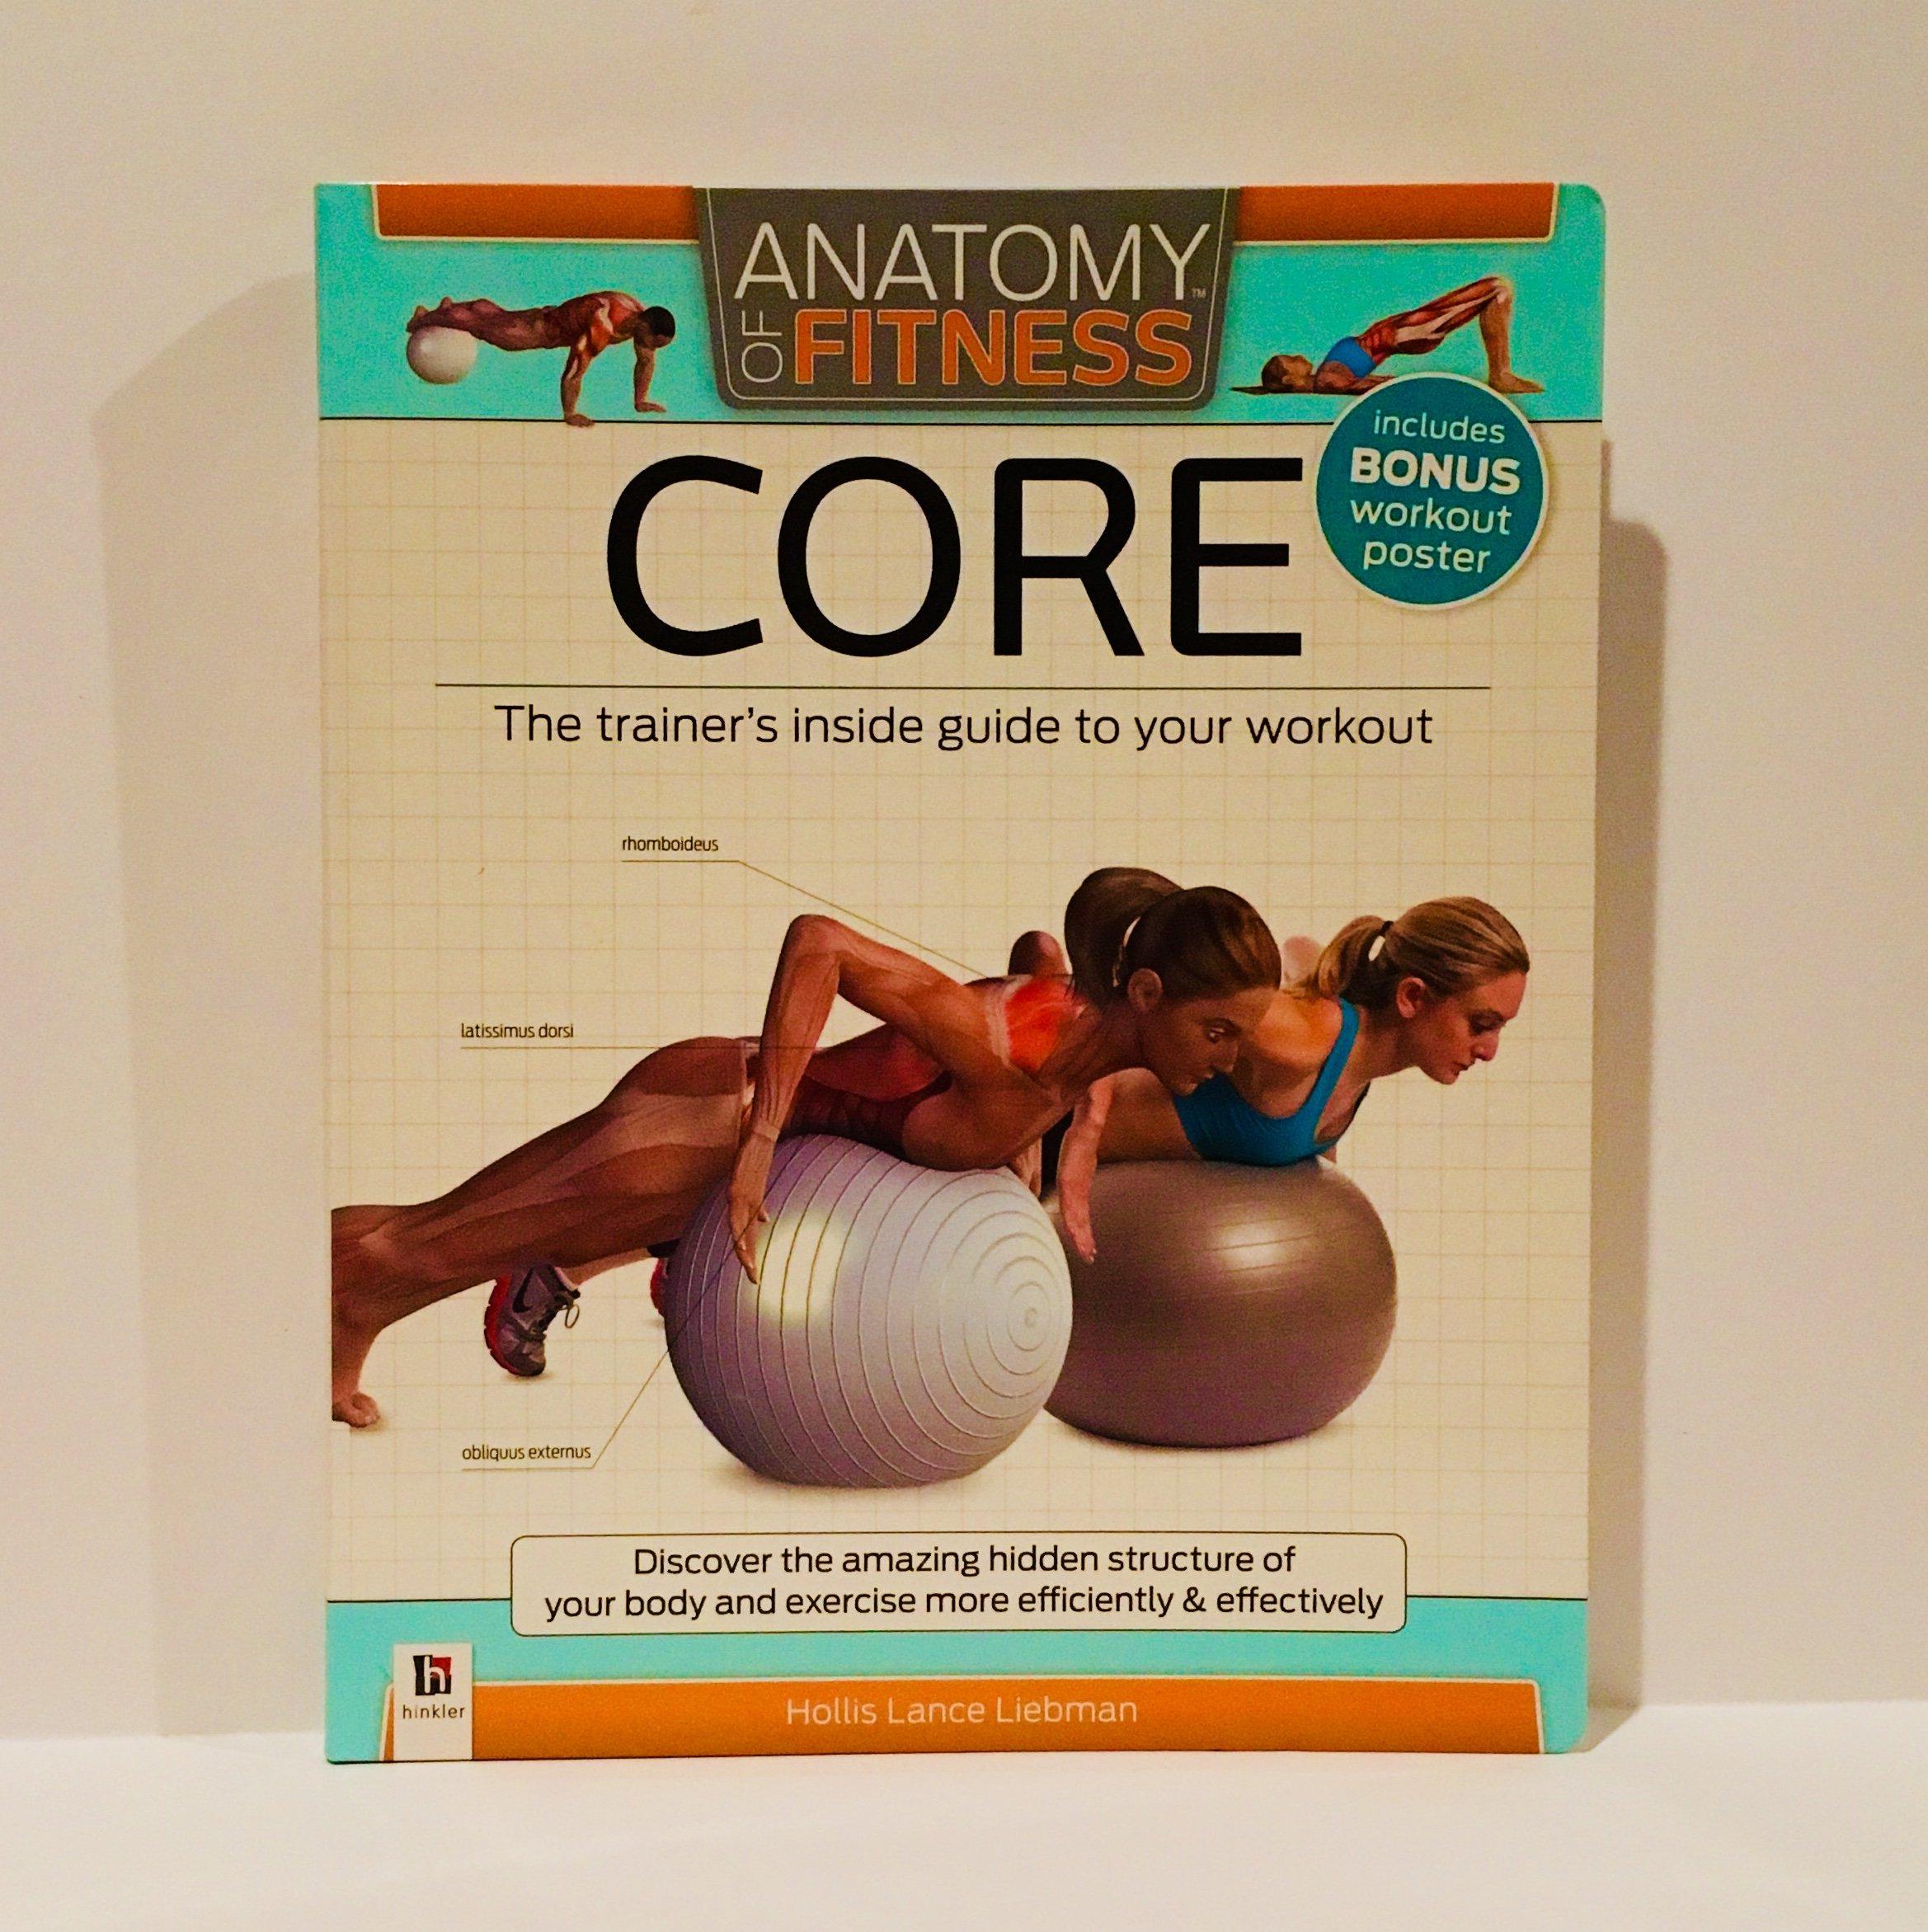 Anatomy of Fitness Core: 9781743677292: Amazon.com: Books